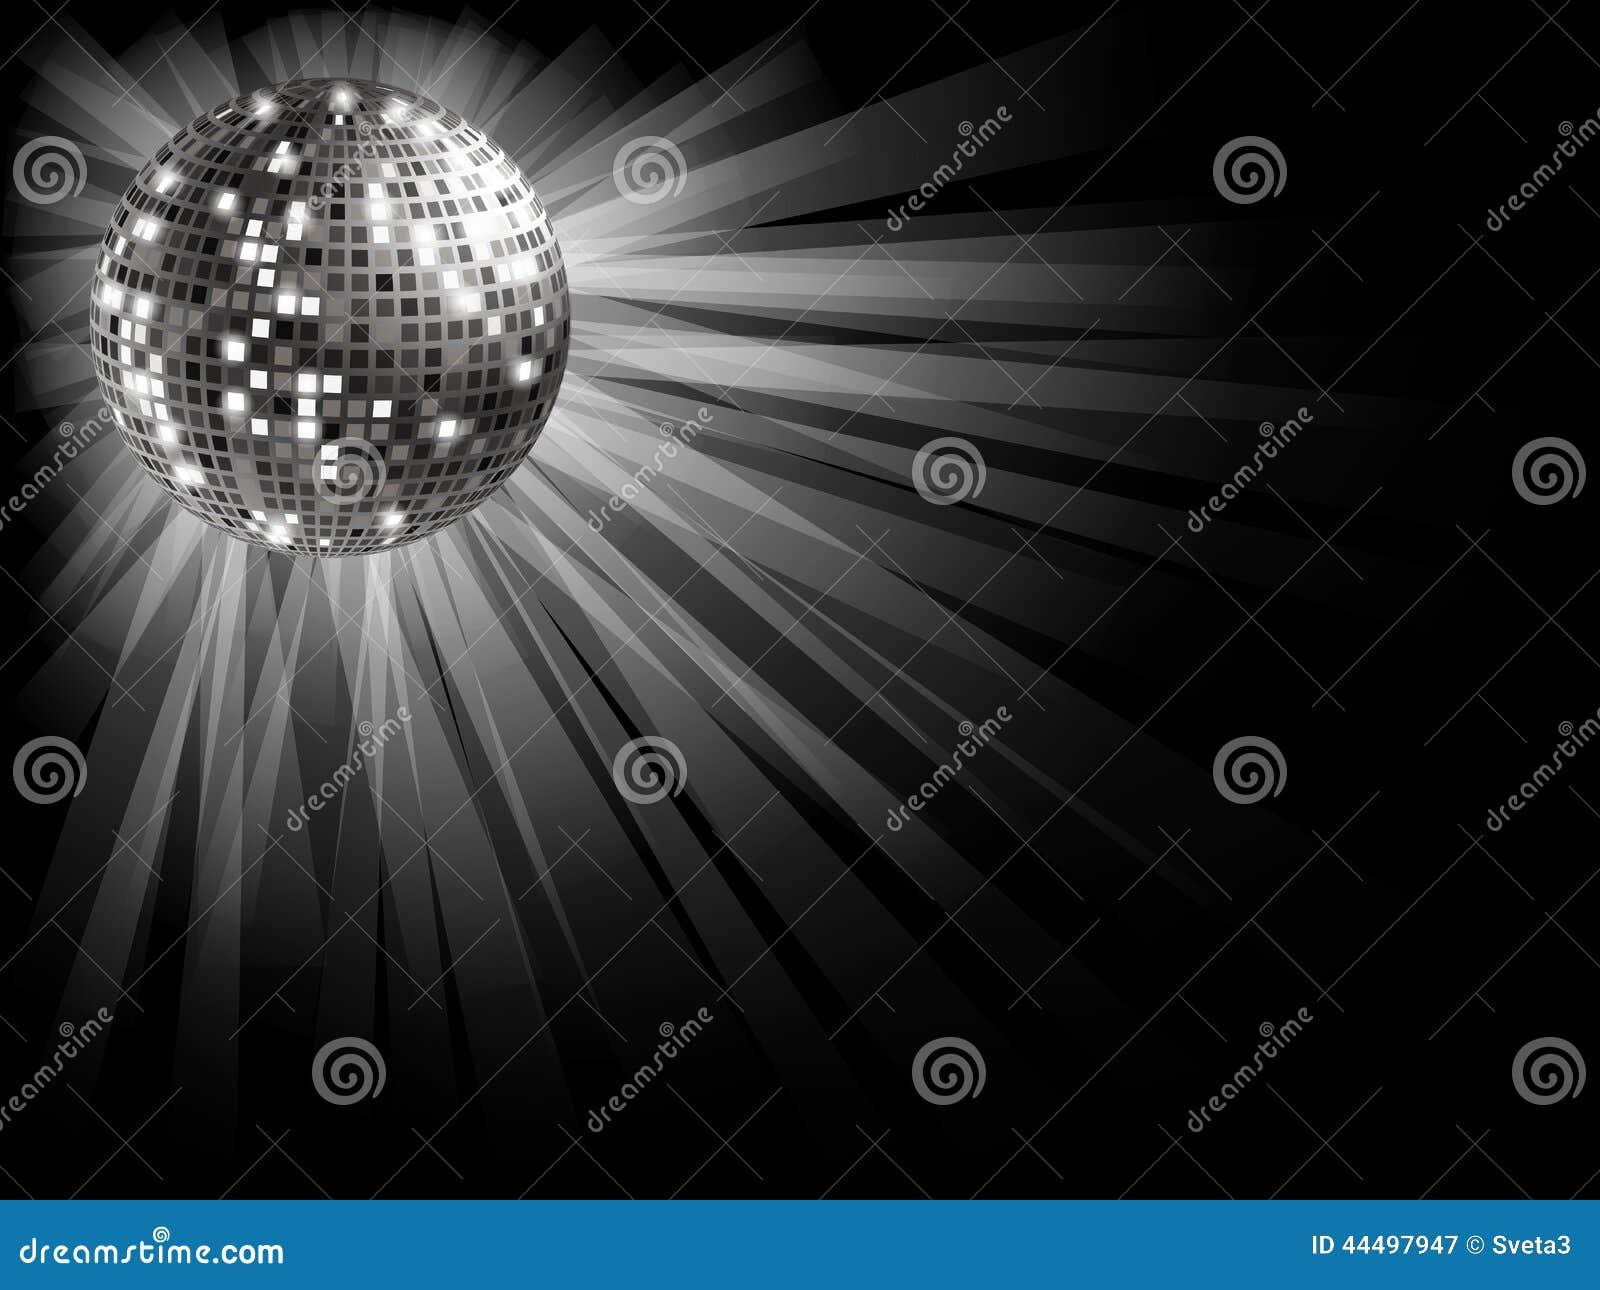 silver disco ball background - photo #10